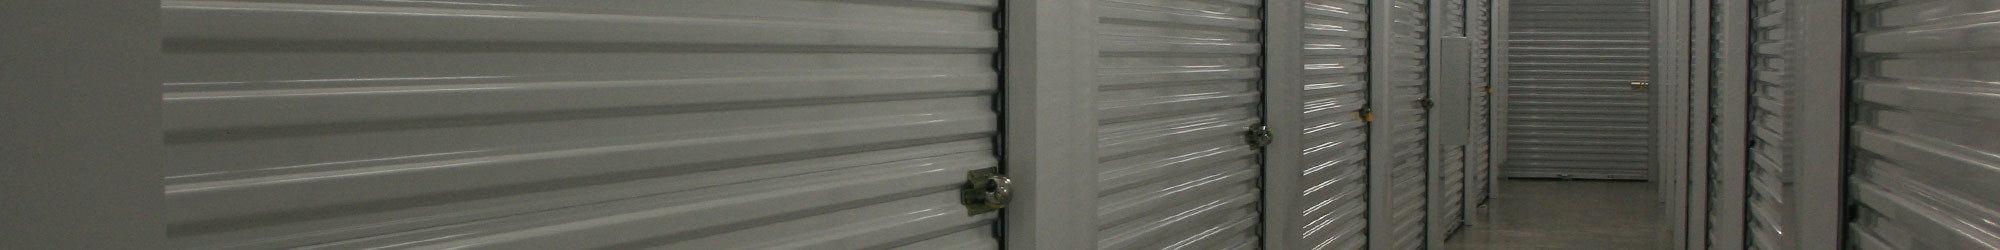 RV & Boat Storage at Space Shop Self Storage in Kennesaw